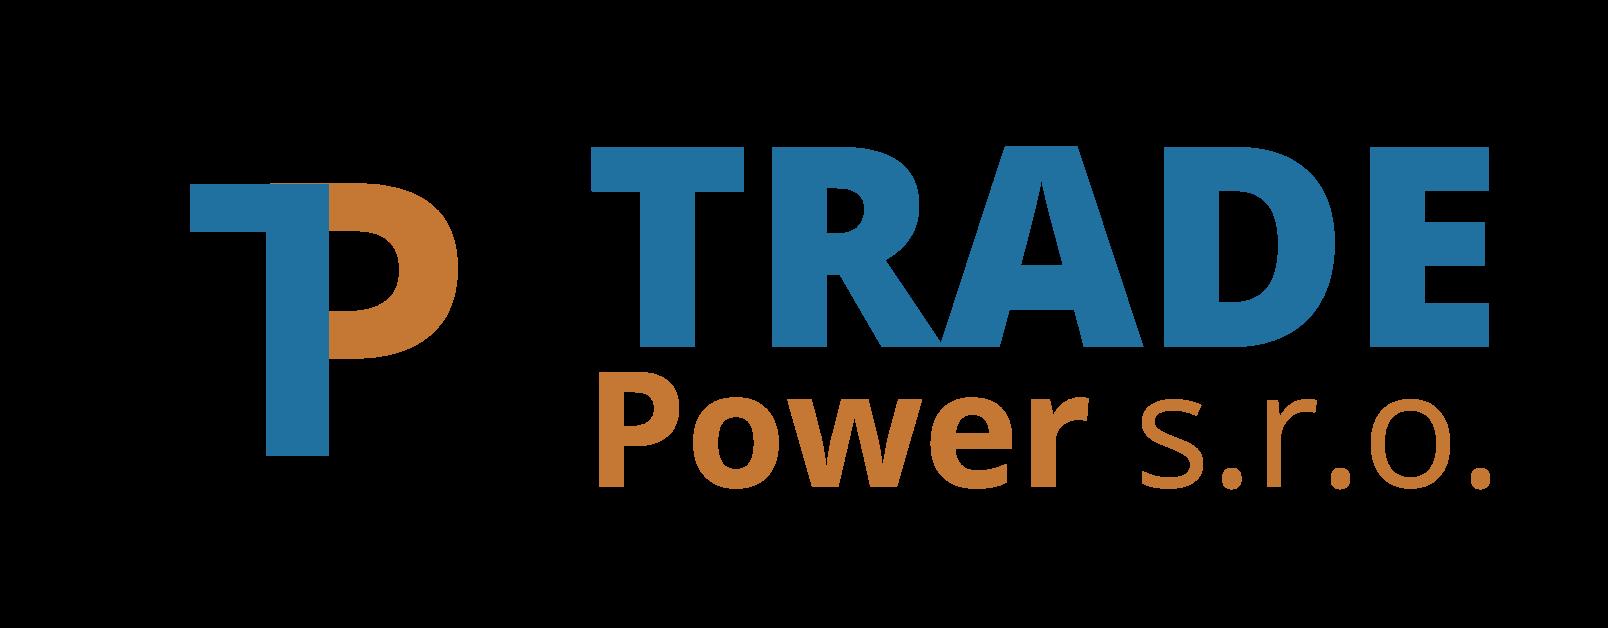 TRADE Power